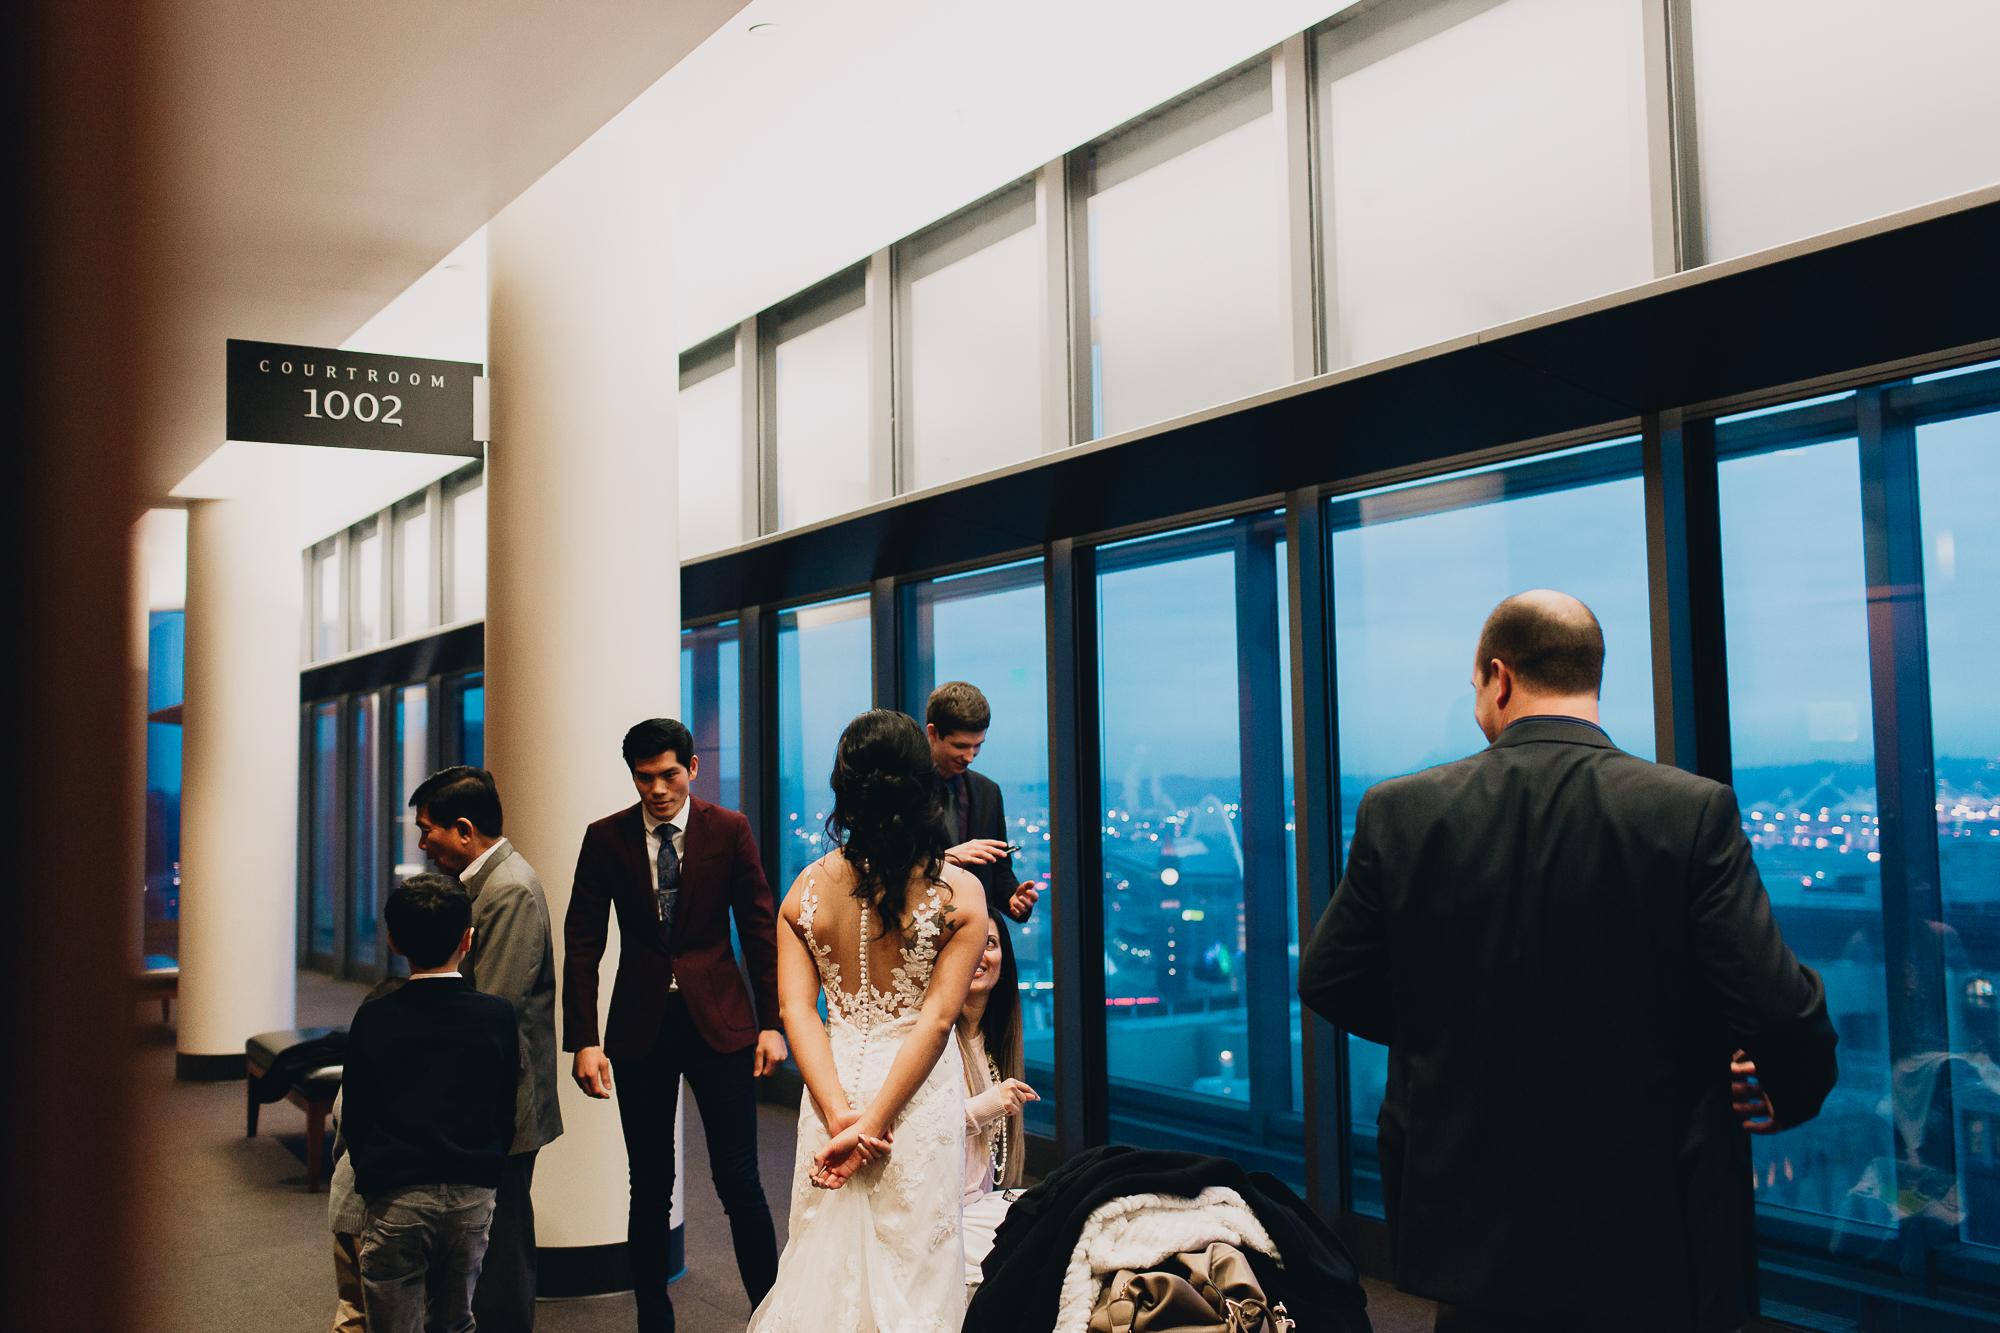 Seattle courthouse wedding photos kristawelch51.jpg